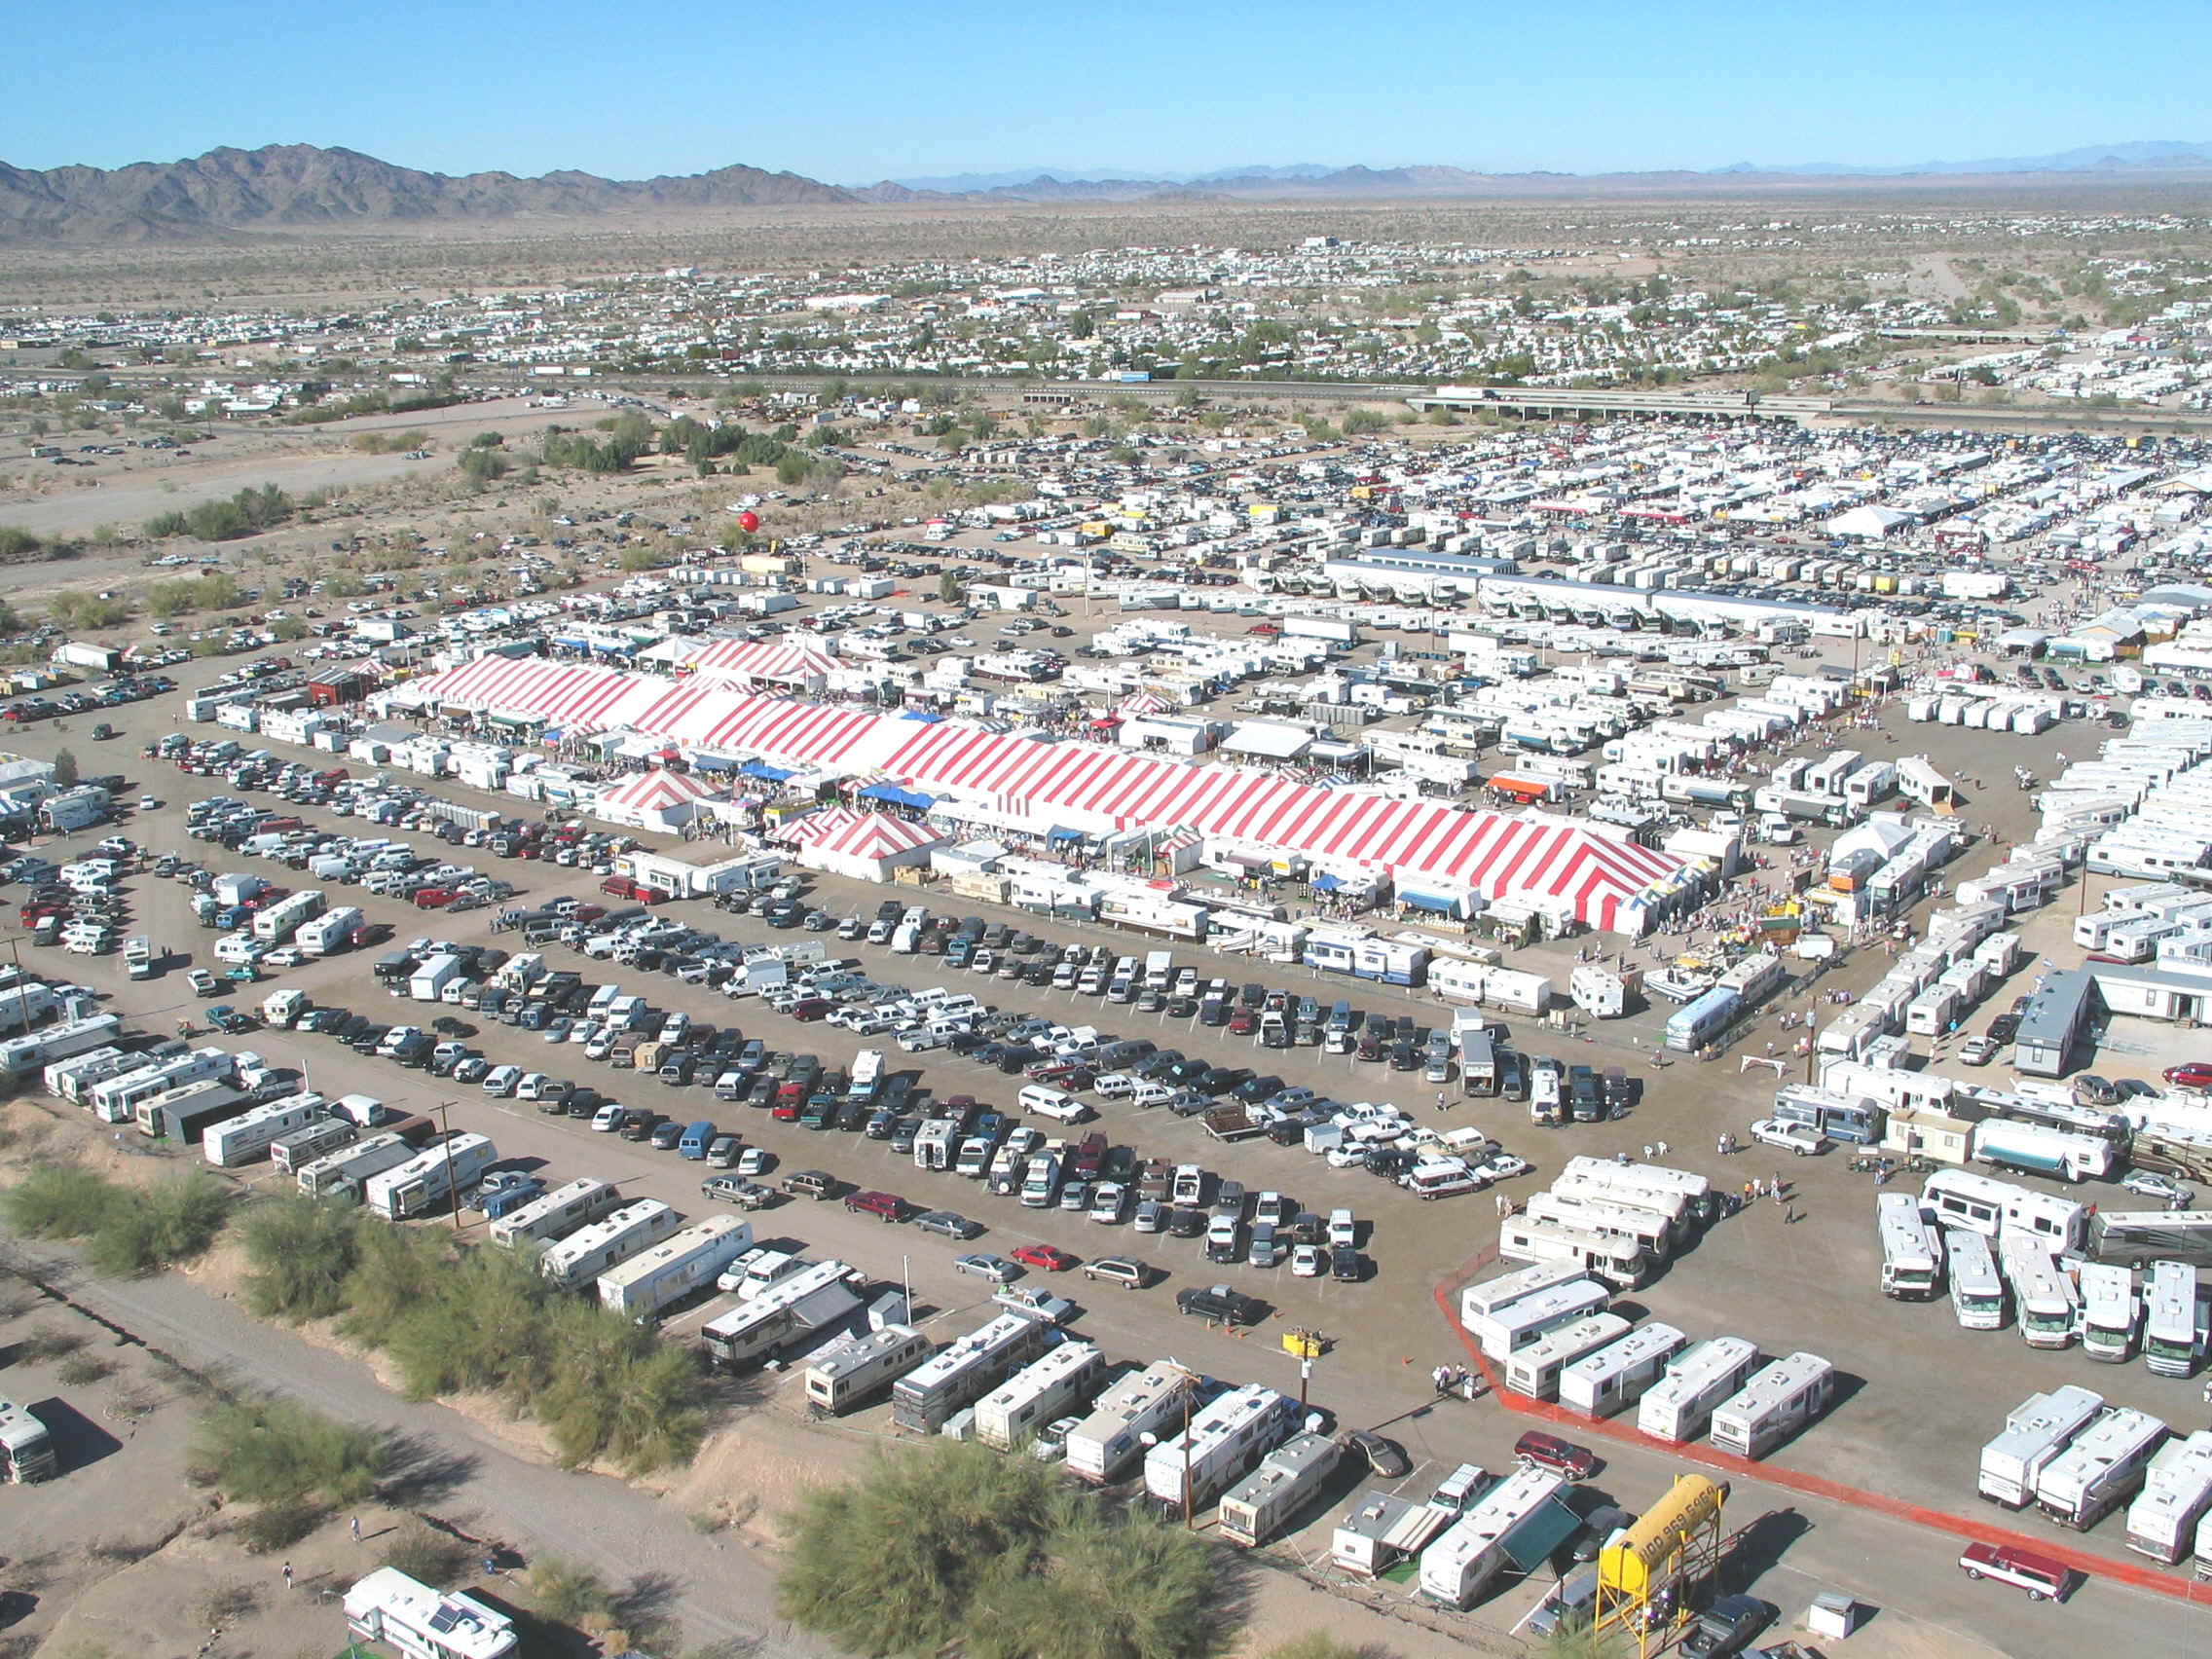 Exposicion De Caravanas En Quartzsite Arizona Usa M 225 Gica